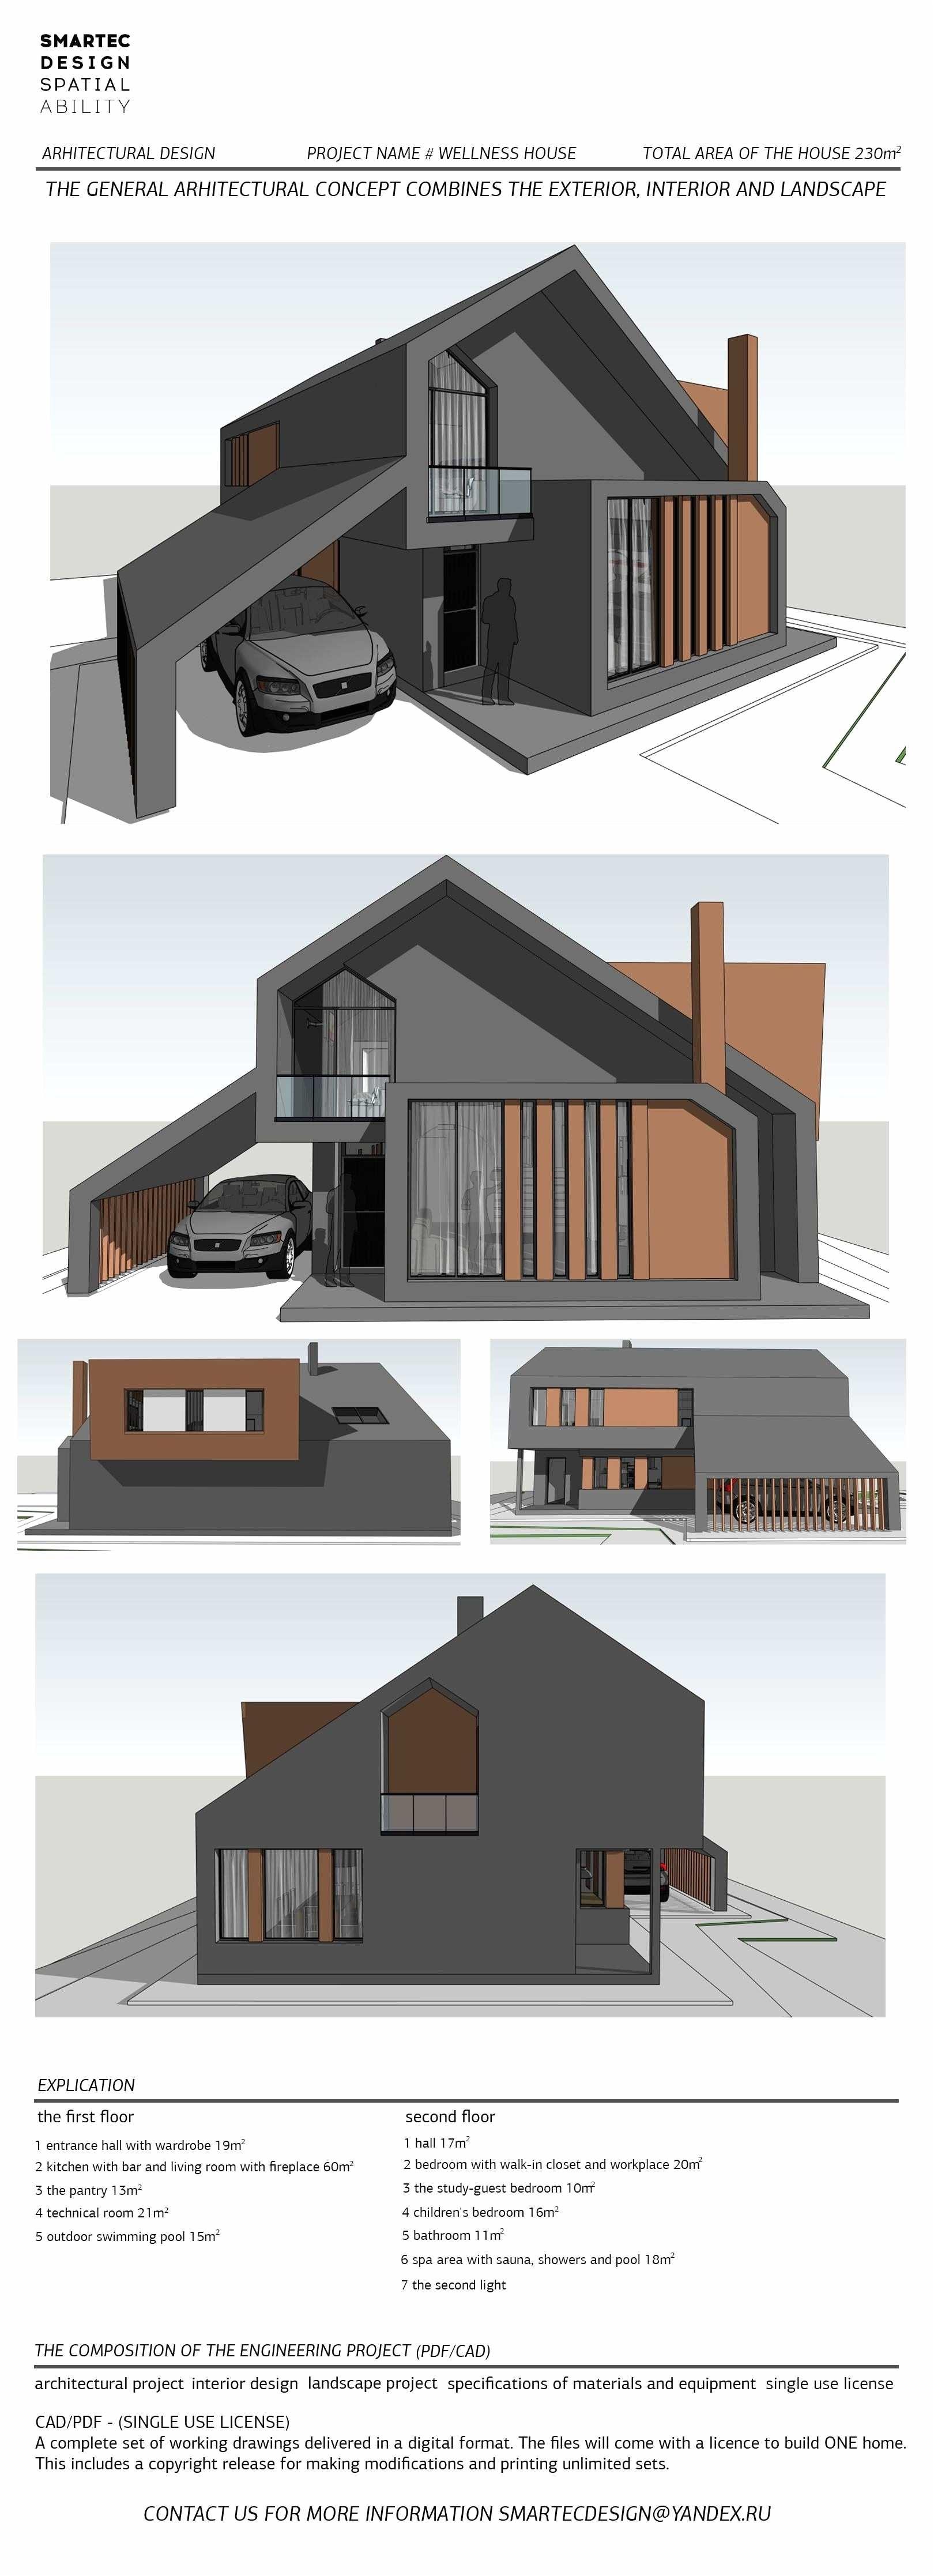 decorative hgtv home design studio at 12 exquisite hgtv home design studio